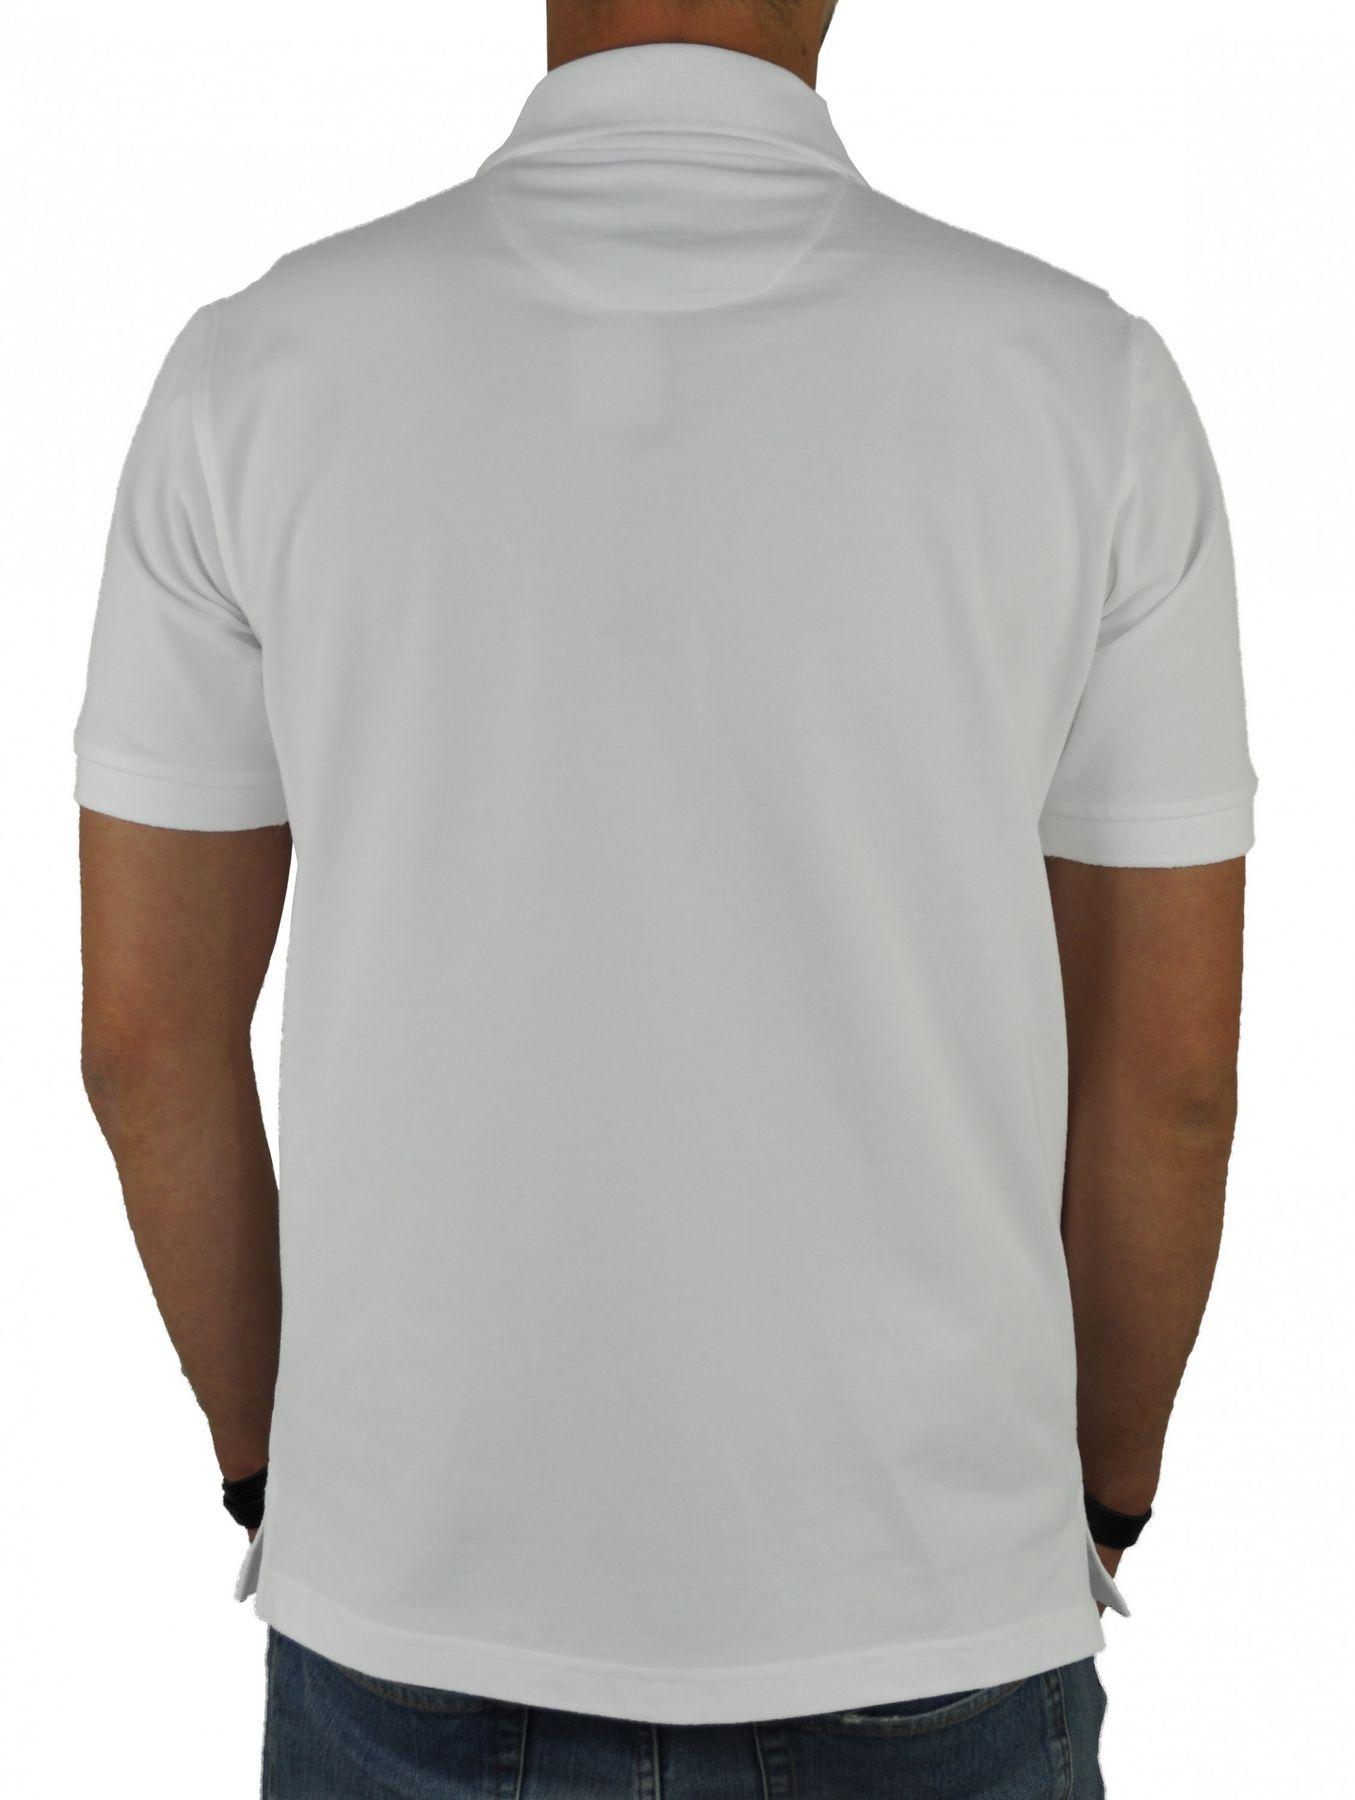 KITARO - Herren Poloshirt in verschiedenen Farben (68800) – Bild 11